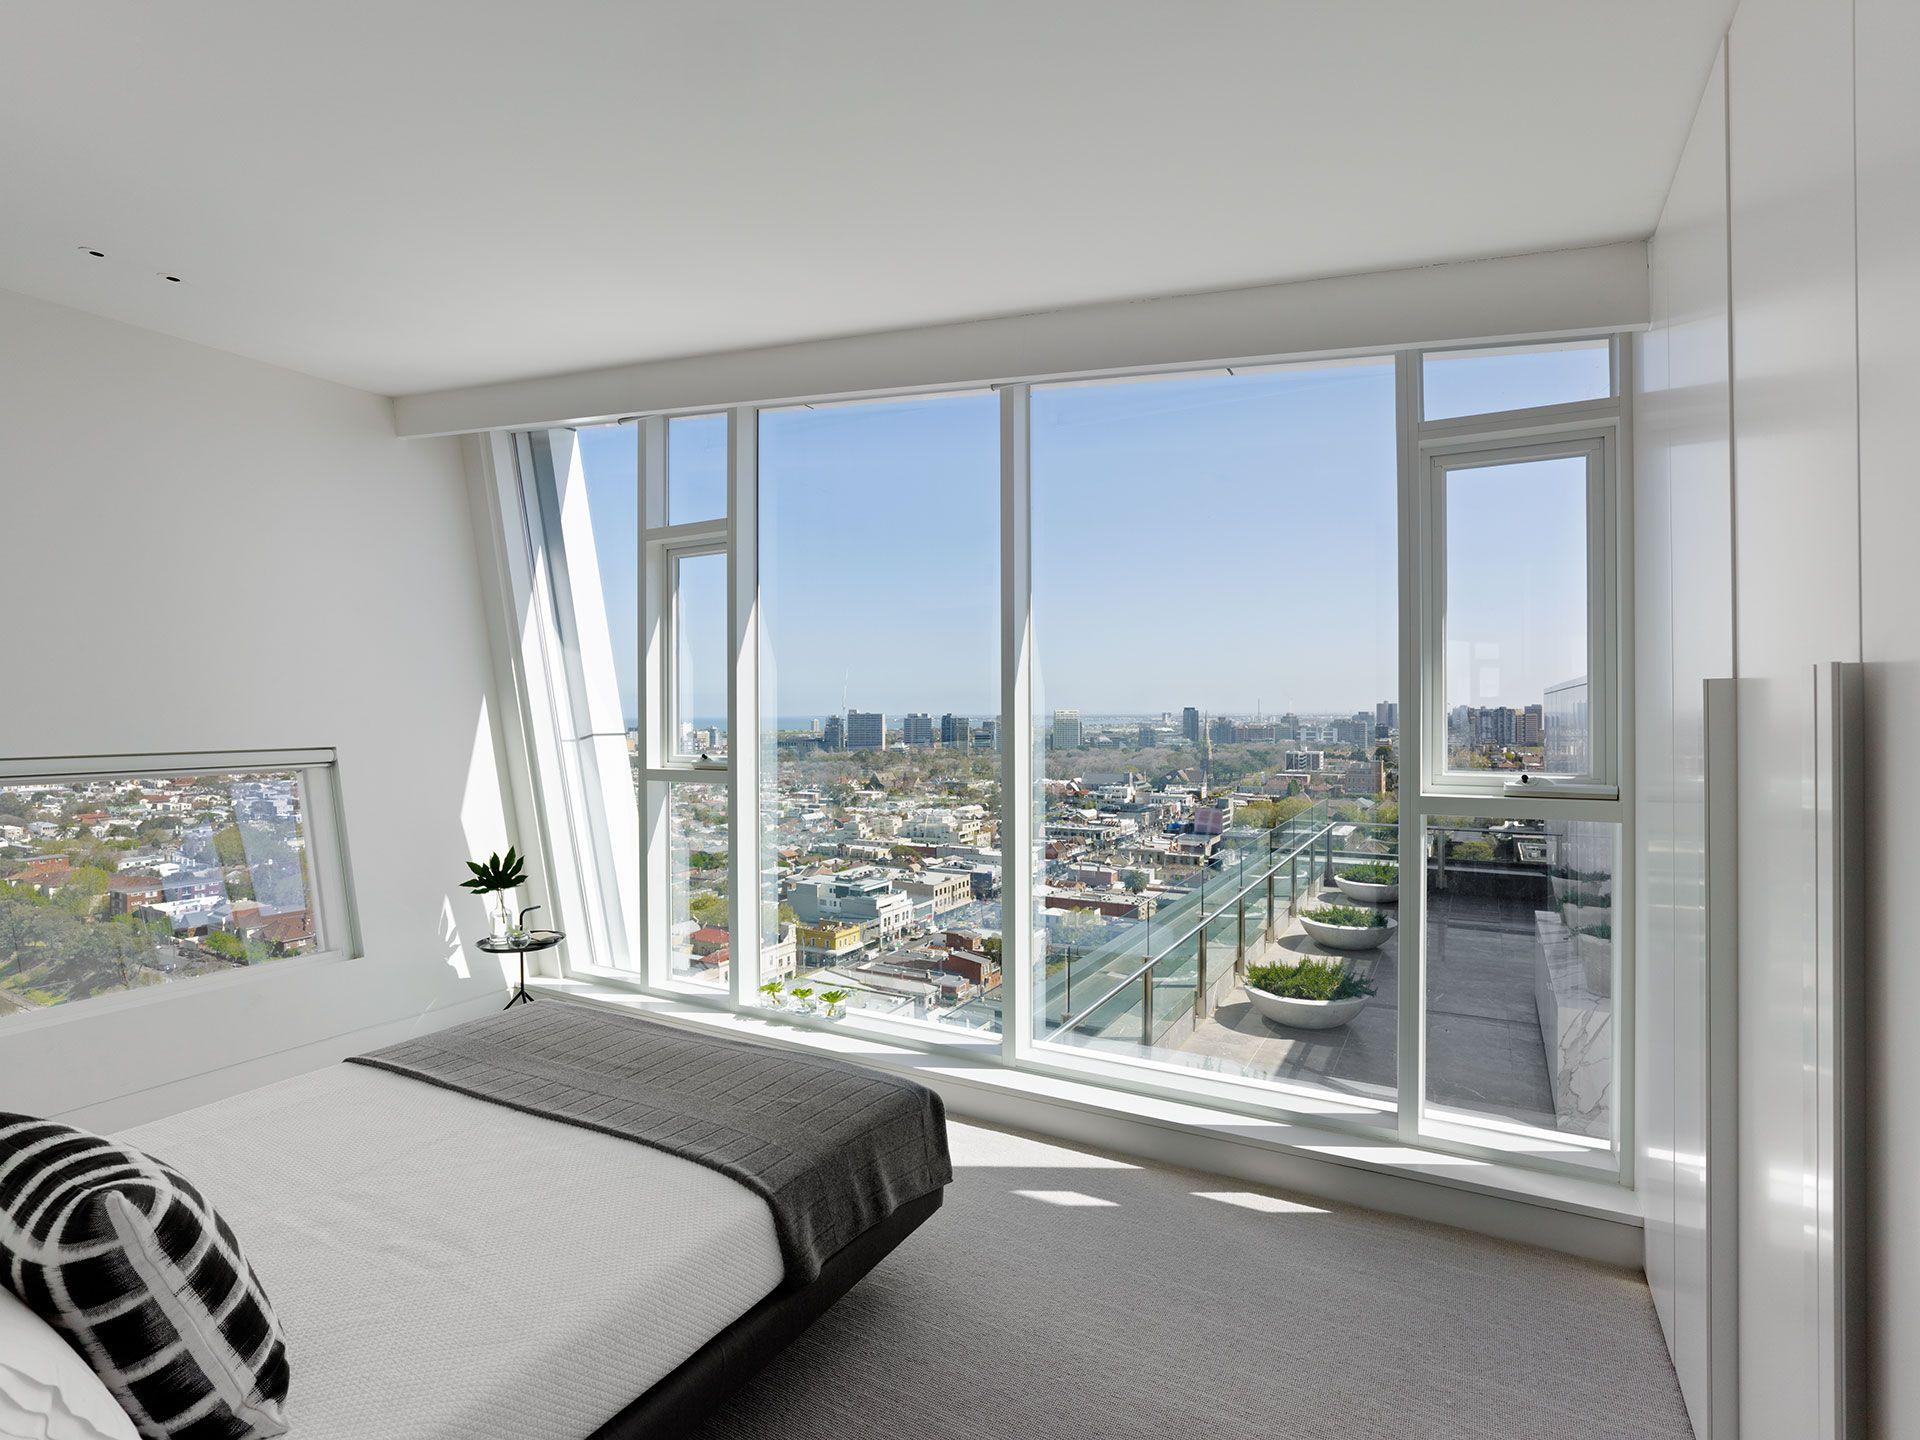 Bdlc 7 yarra penthouse 04 wr